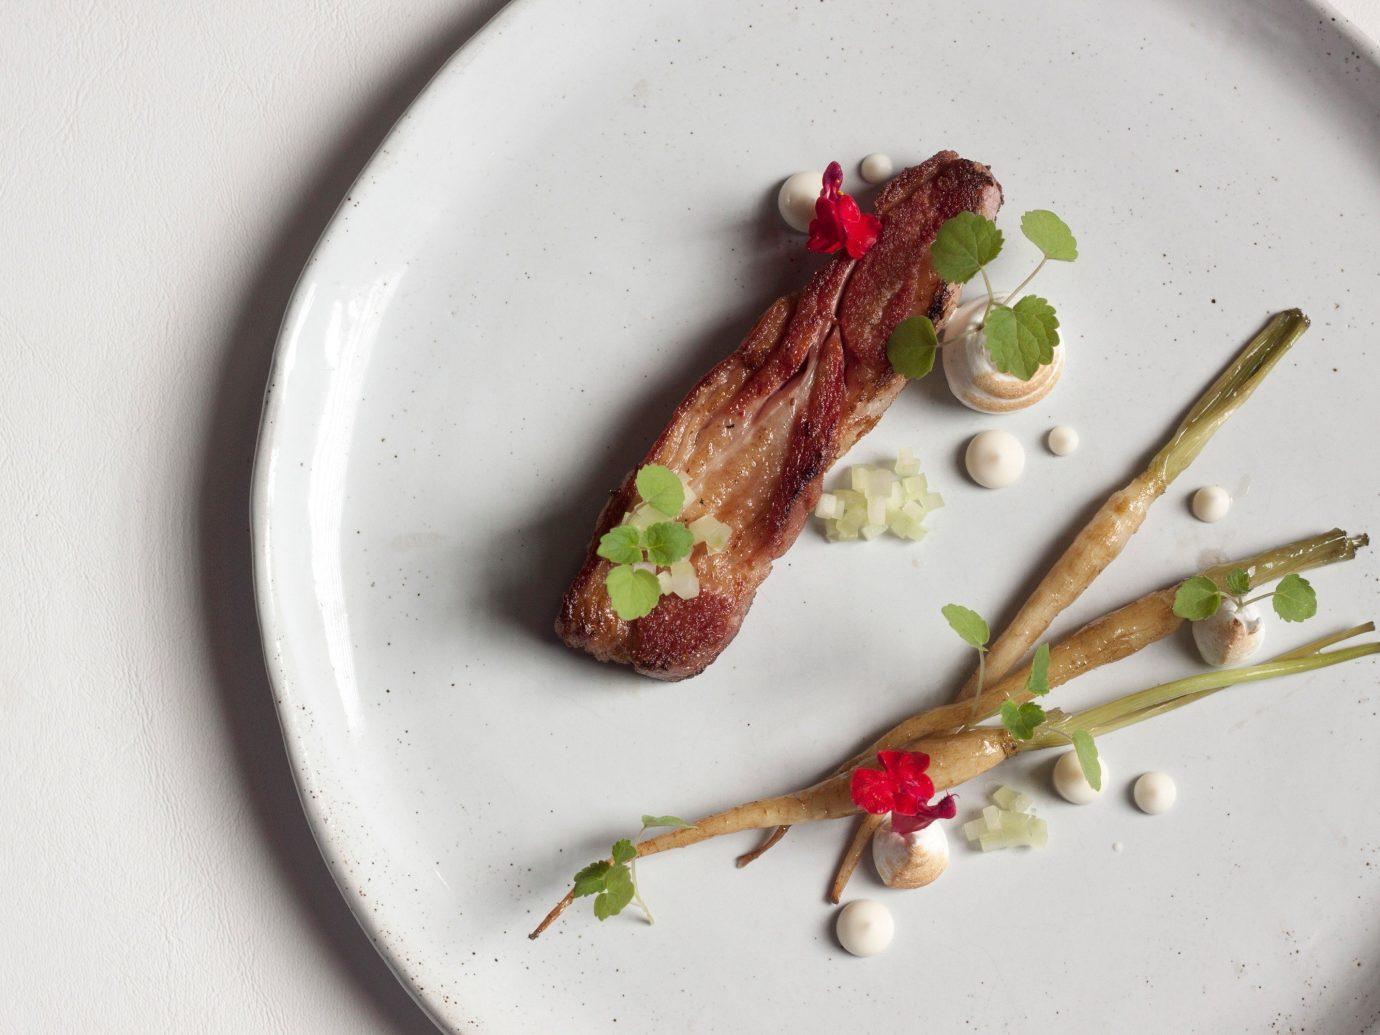 Summer Series plate food dish produce plant white slice vegetable meal dessert fruit sliced meat